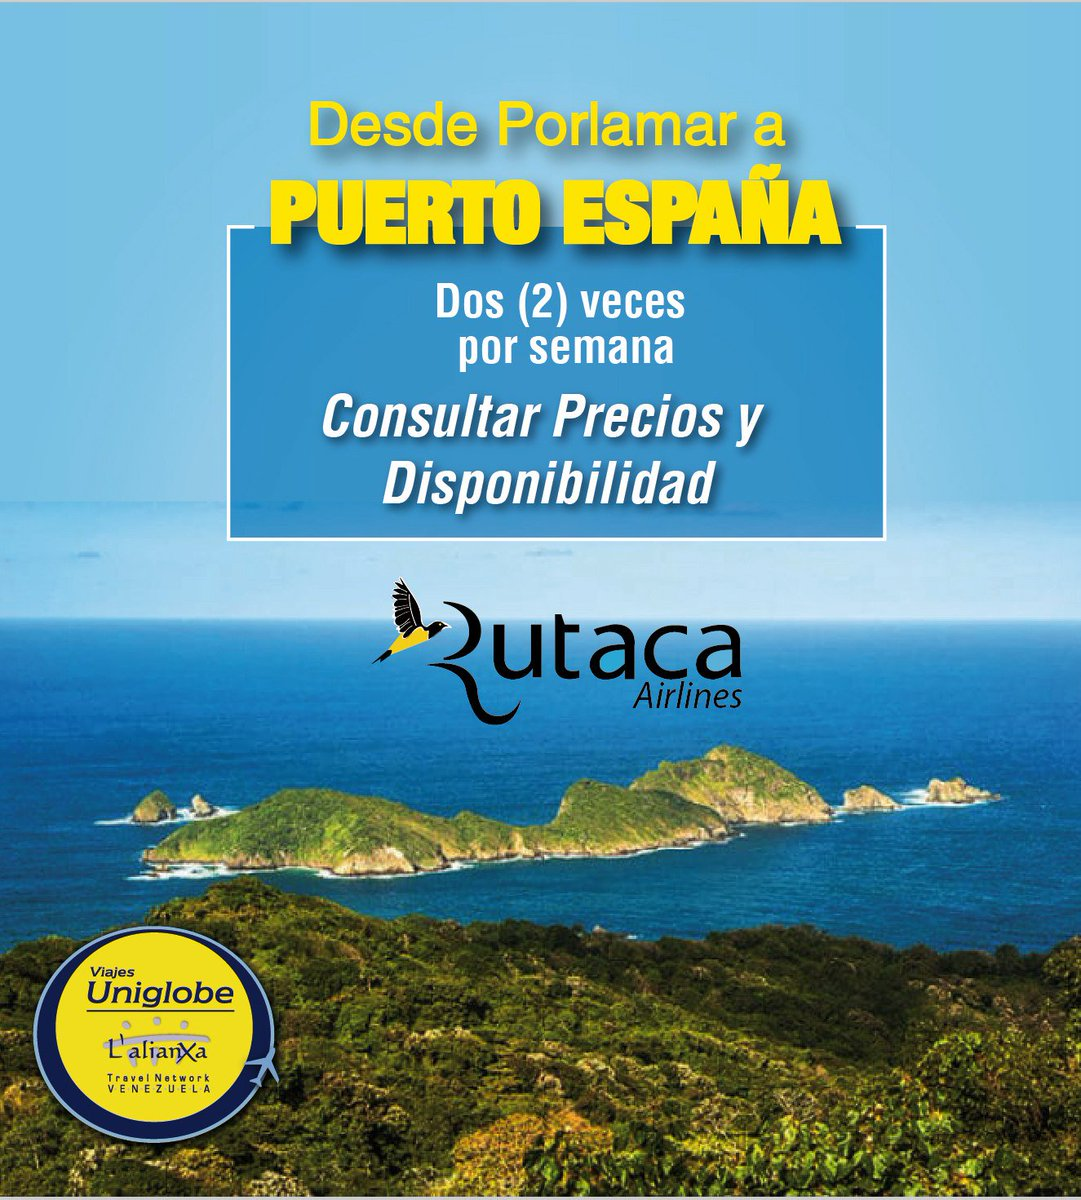 #Puertoespaña con con @rutaca #viajesuniglobe #somosuniglobe #turismo #like #f4f #follow #like4like #instapohoto pic.twitter.com/9lujCFJzYD